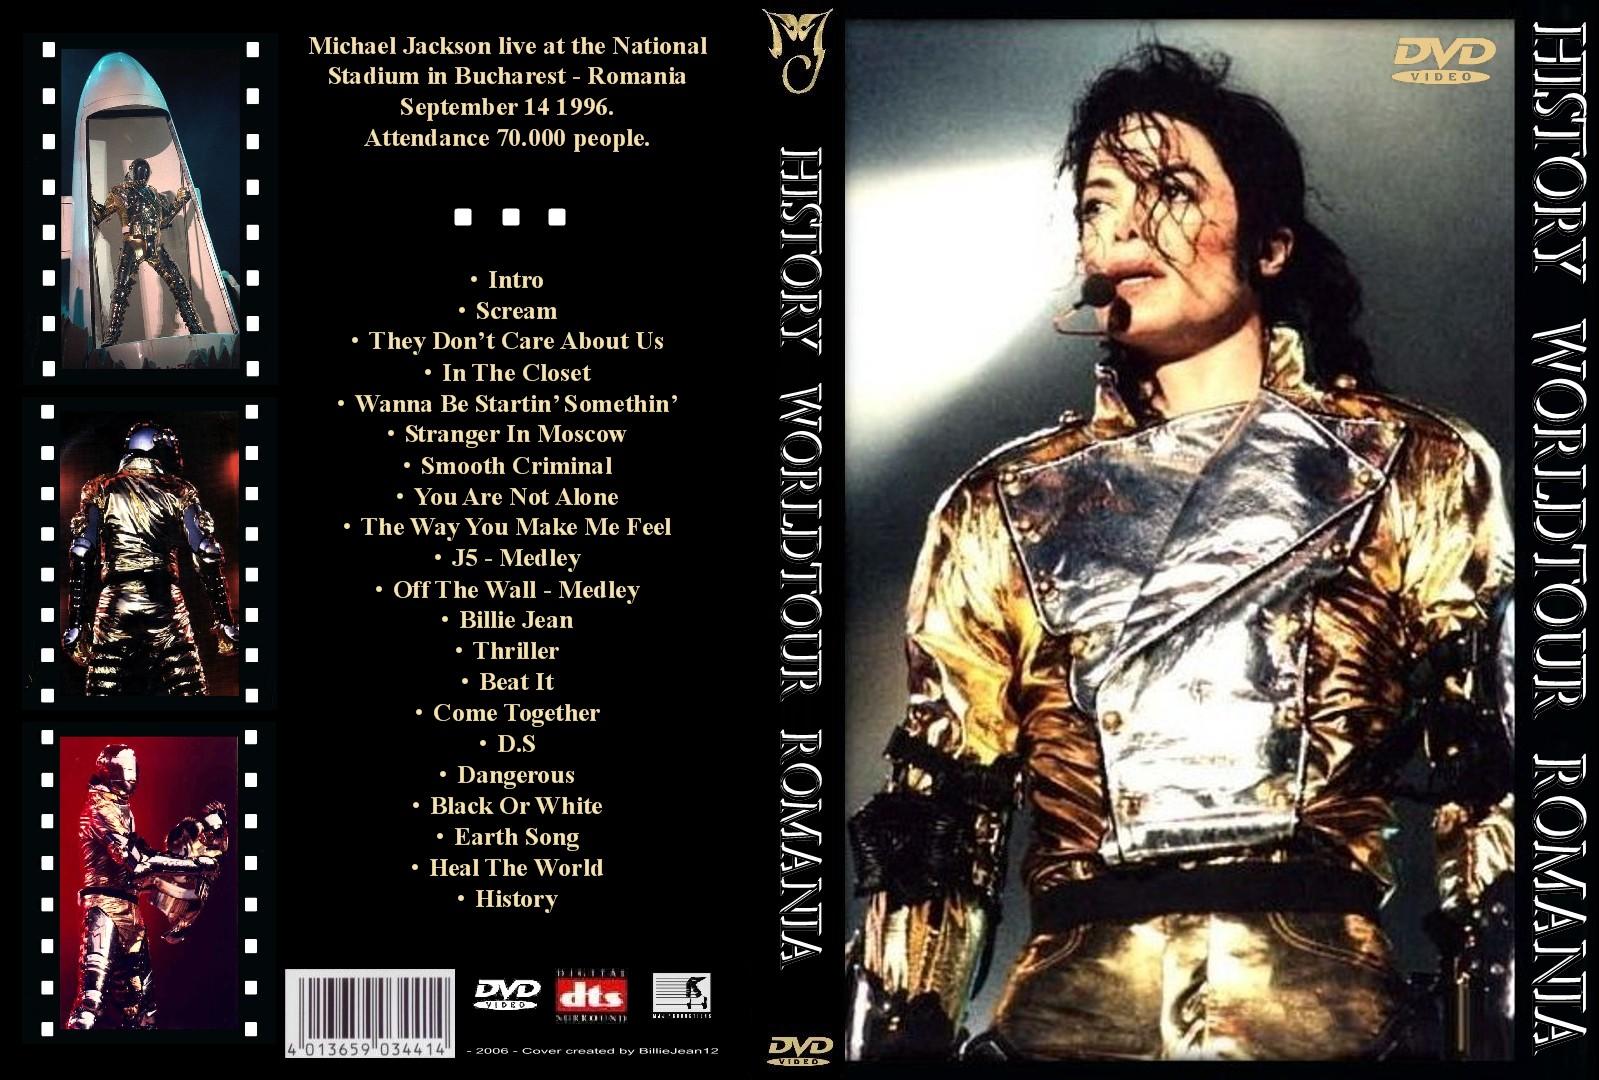 Michael Jackson Bucharest | 6k...